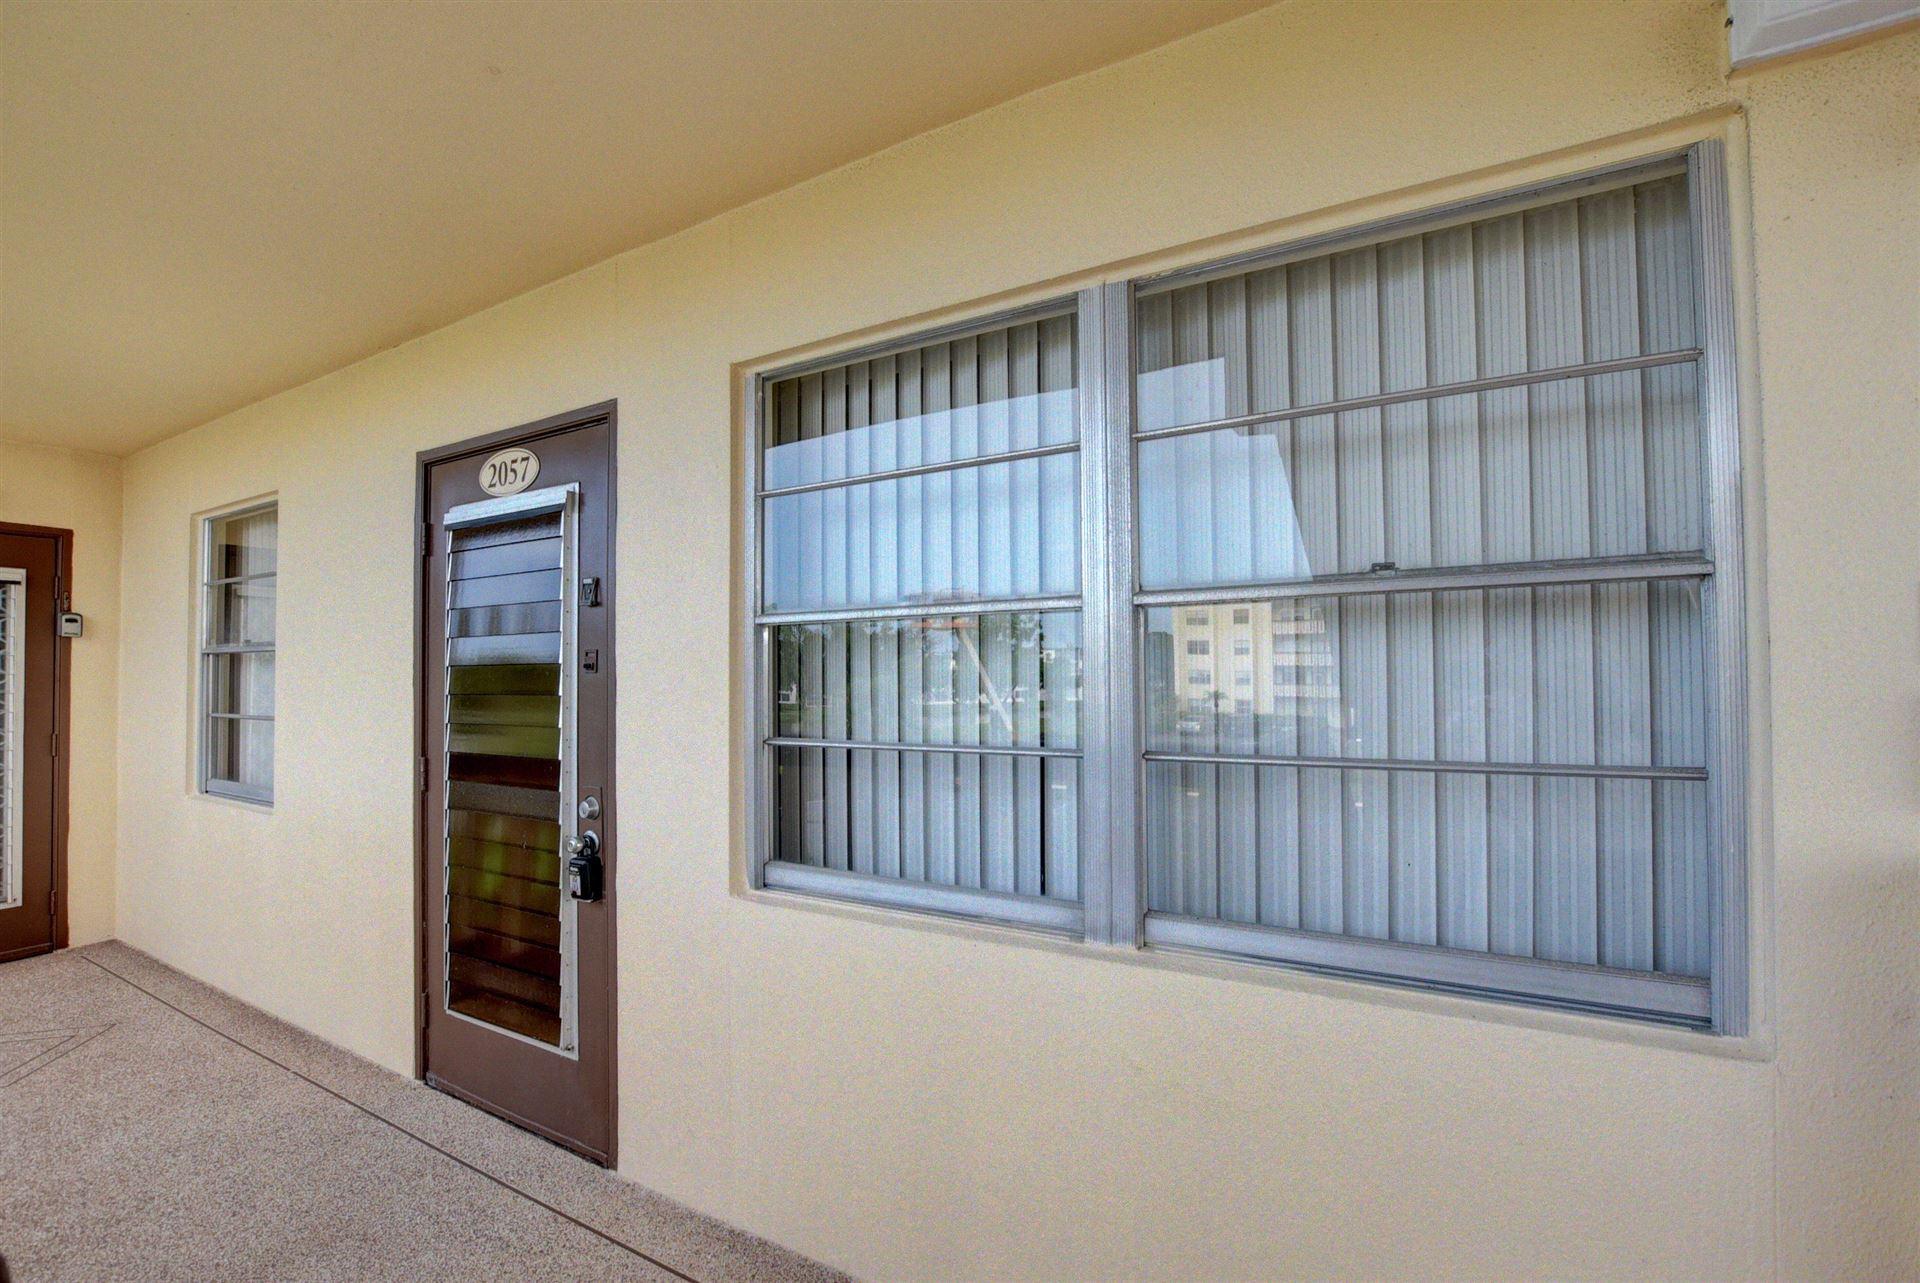 2057 Wolverton C, Boca Raton, FL 33434 - #: RX-10636879